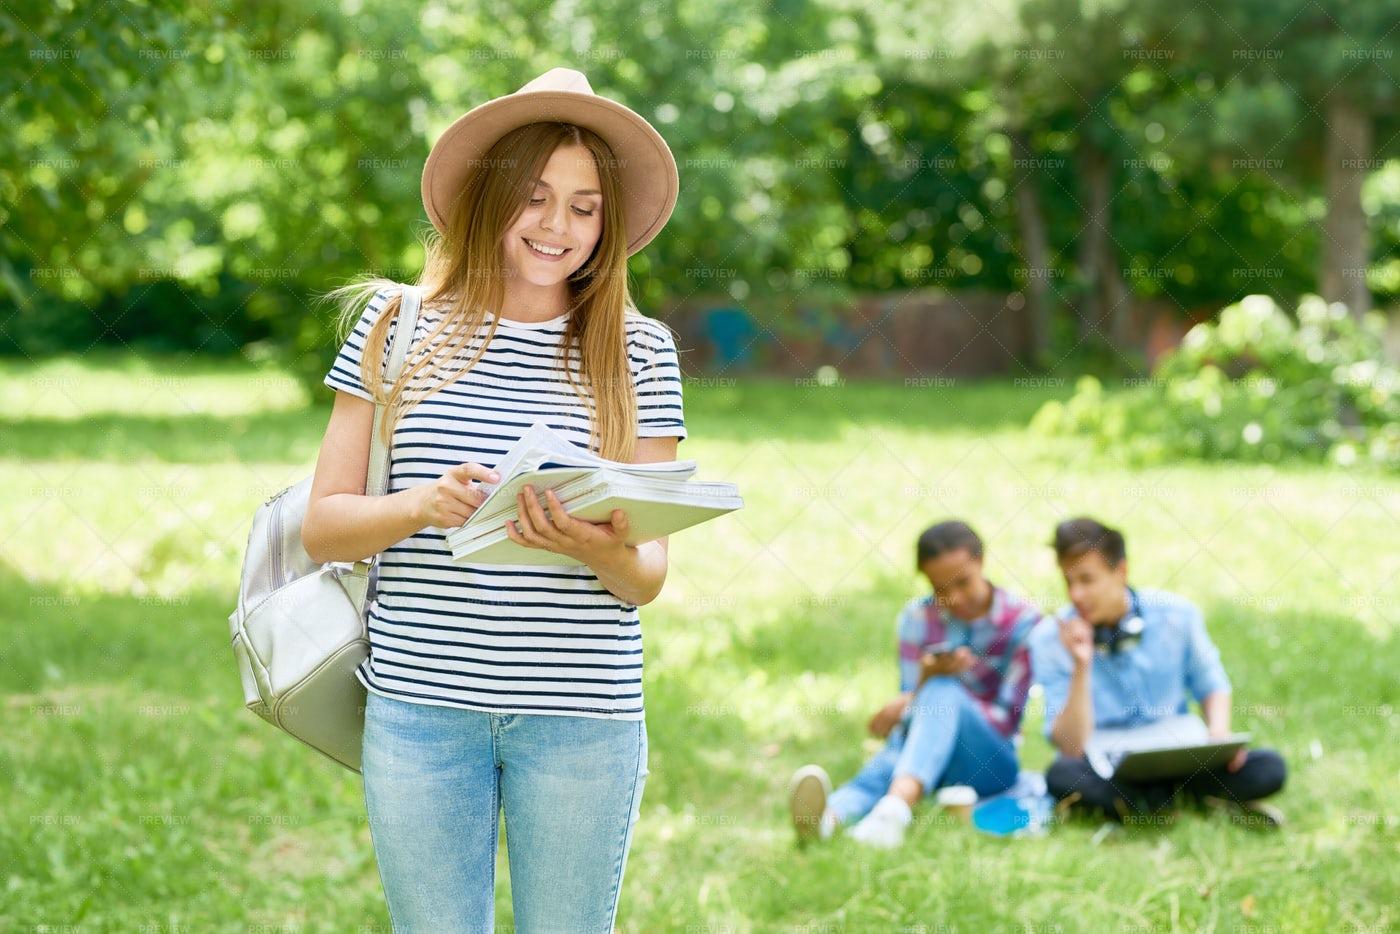 Beautiful Female Student Outdoors: Stock Photos